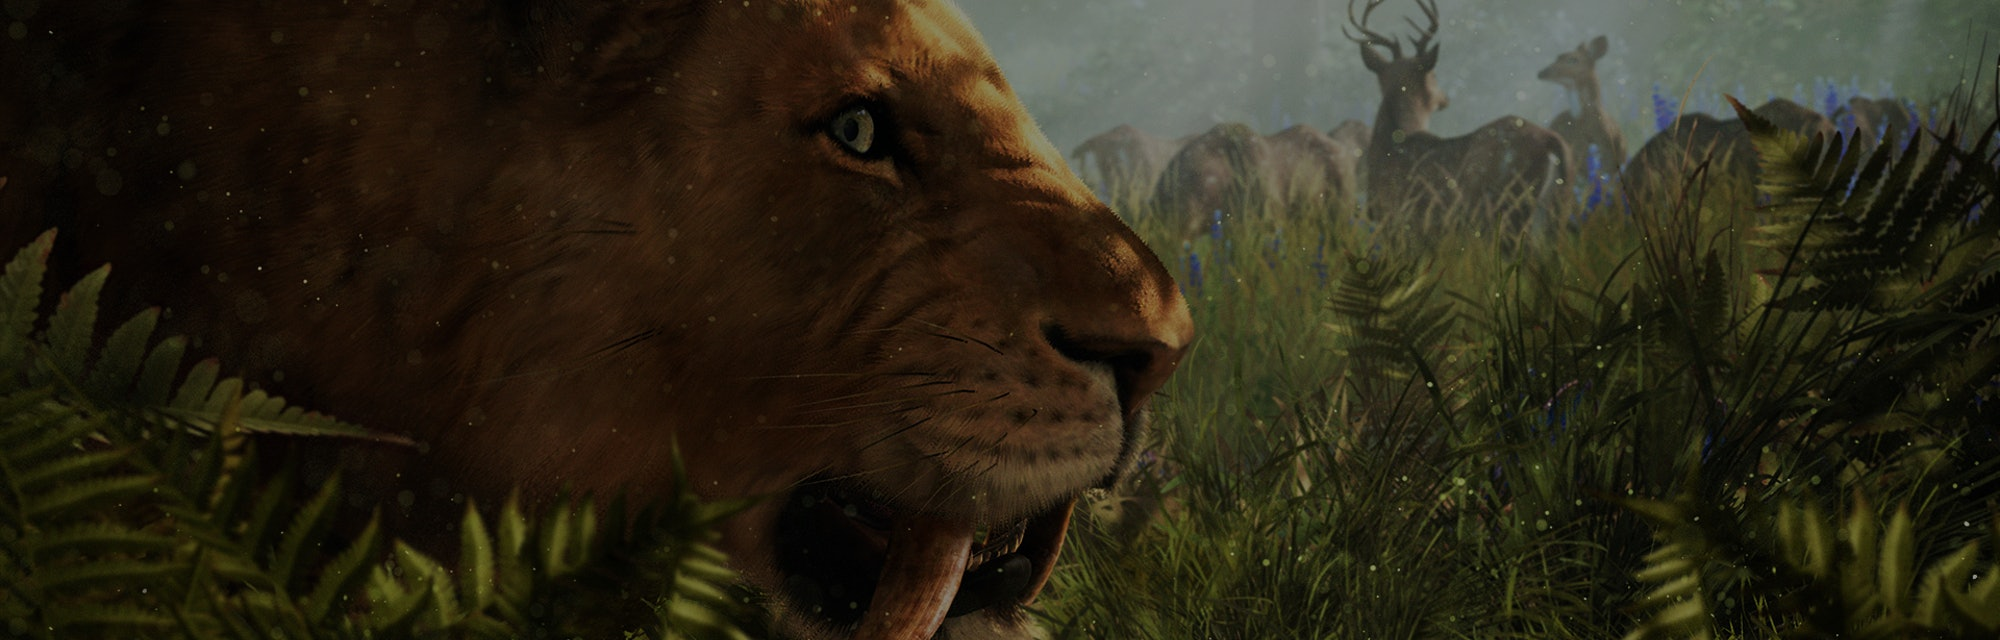 beast far cry primal animals